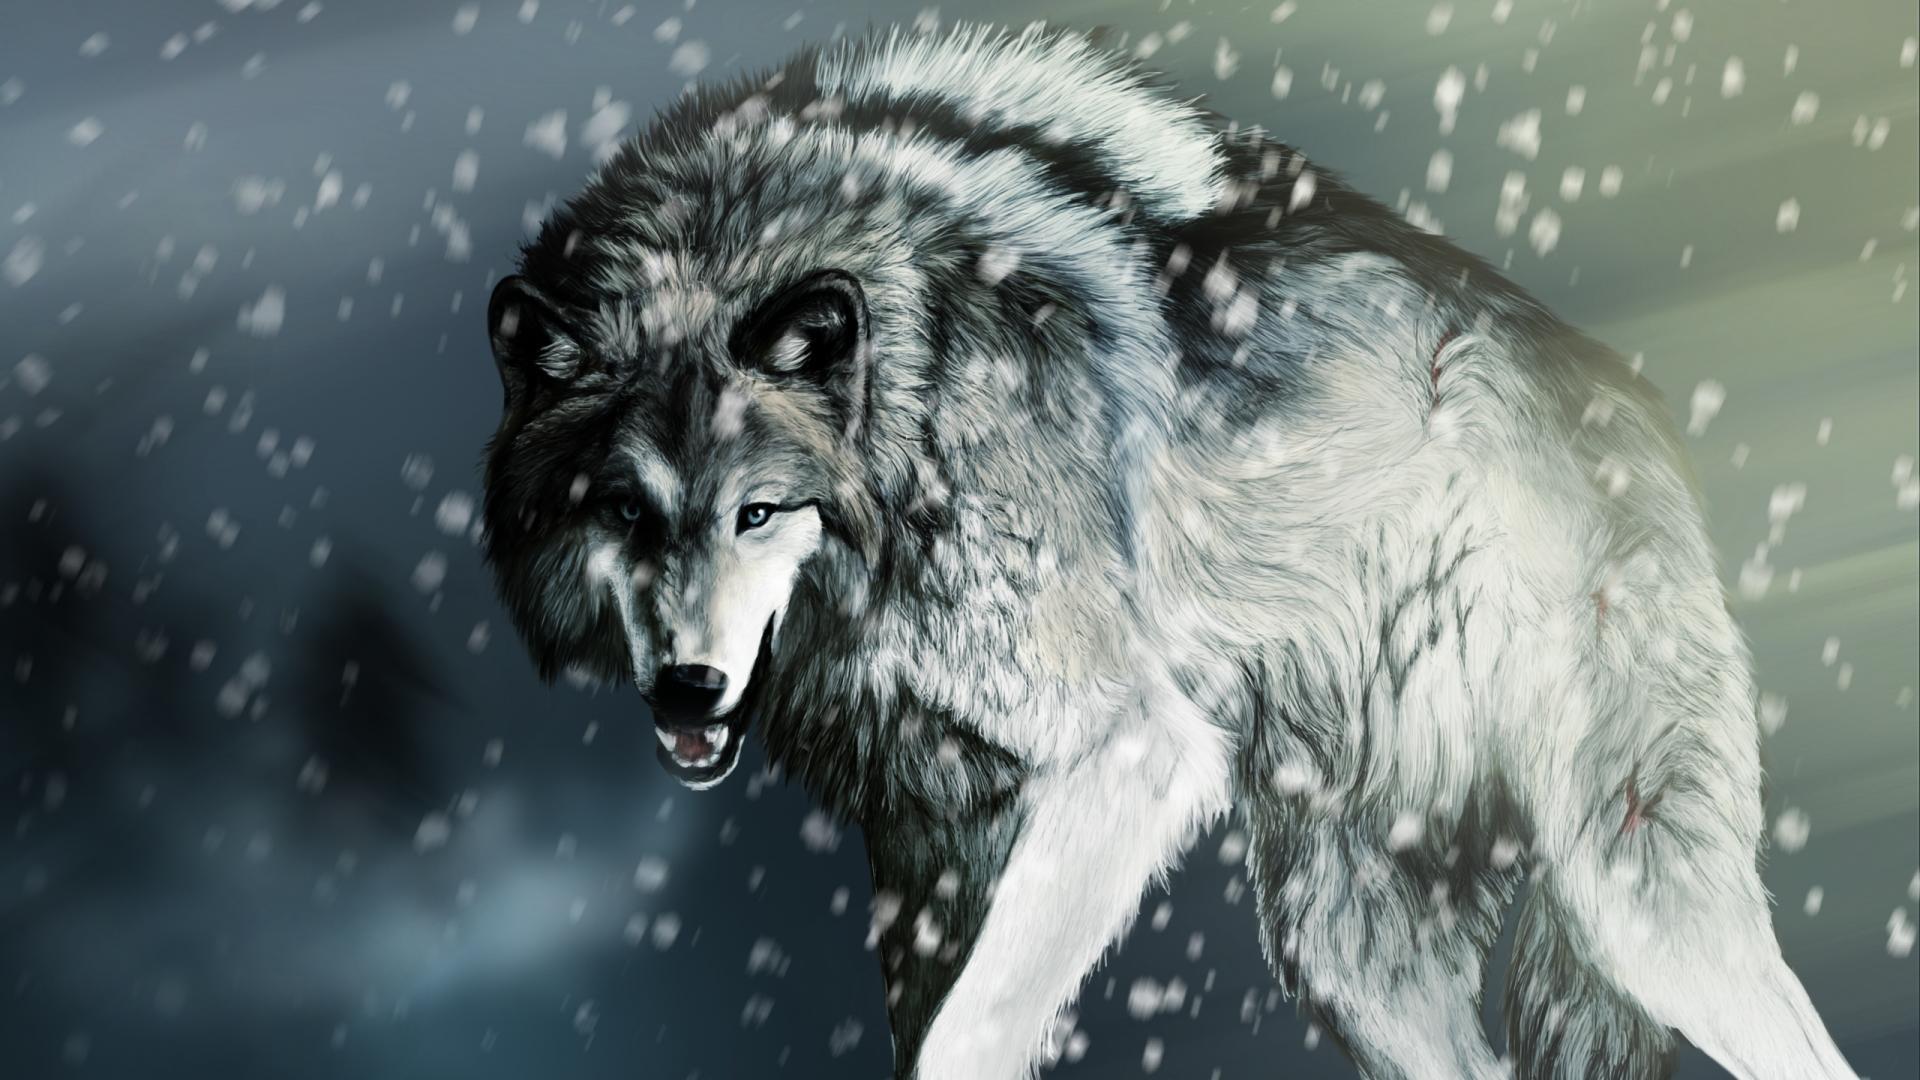 74 Wolf Wallpaper Hd On Wallpapersafari